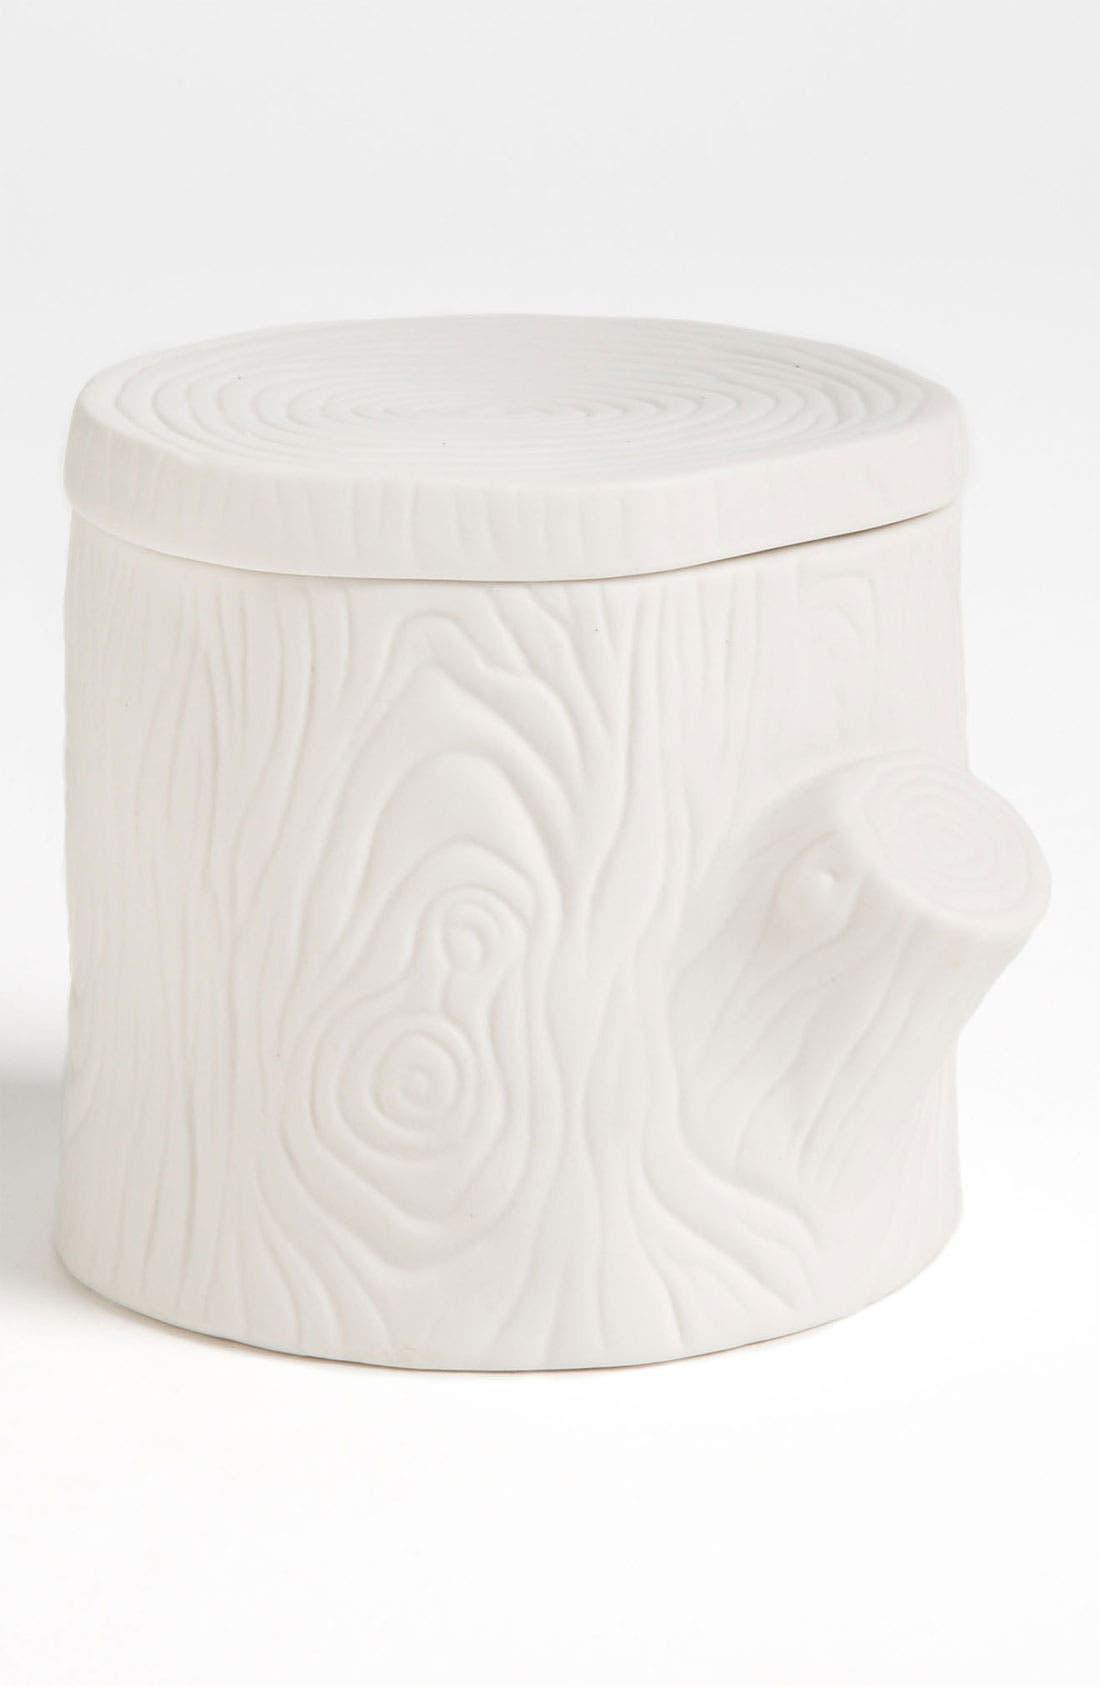 Alternate Image 1 Selected - 'Junk in The Trunk' Ceramic Box